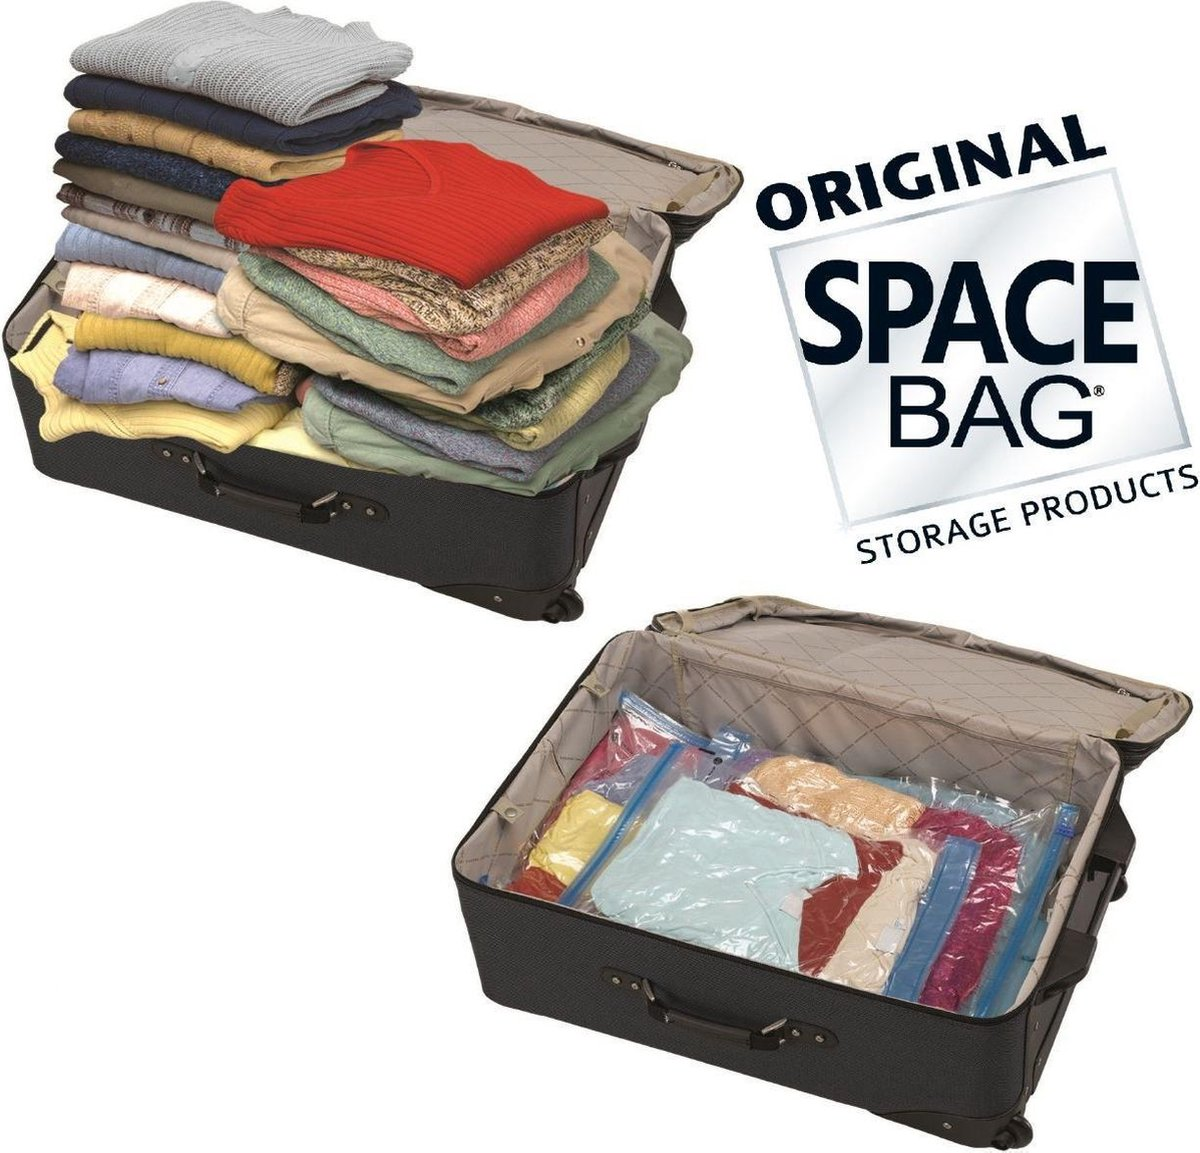 Space Bag vacuumzakken Travel Set - Space Bag